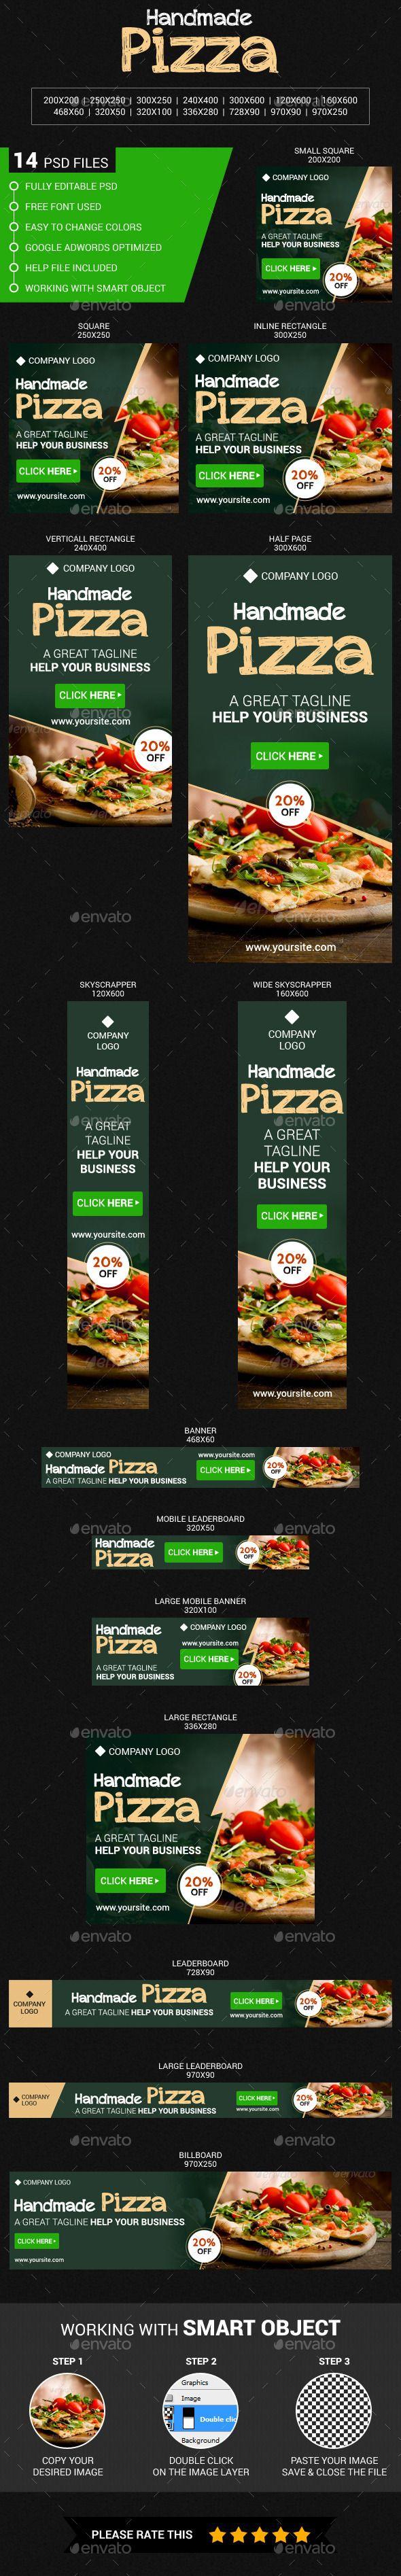 Handmade Pizza Web Banners Template PSD #design #ads Download: http://graphicriver.net/item/handmade-pizza/13183345?ref=ksioks